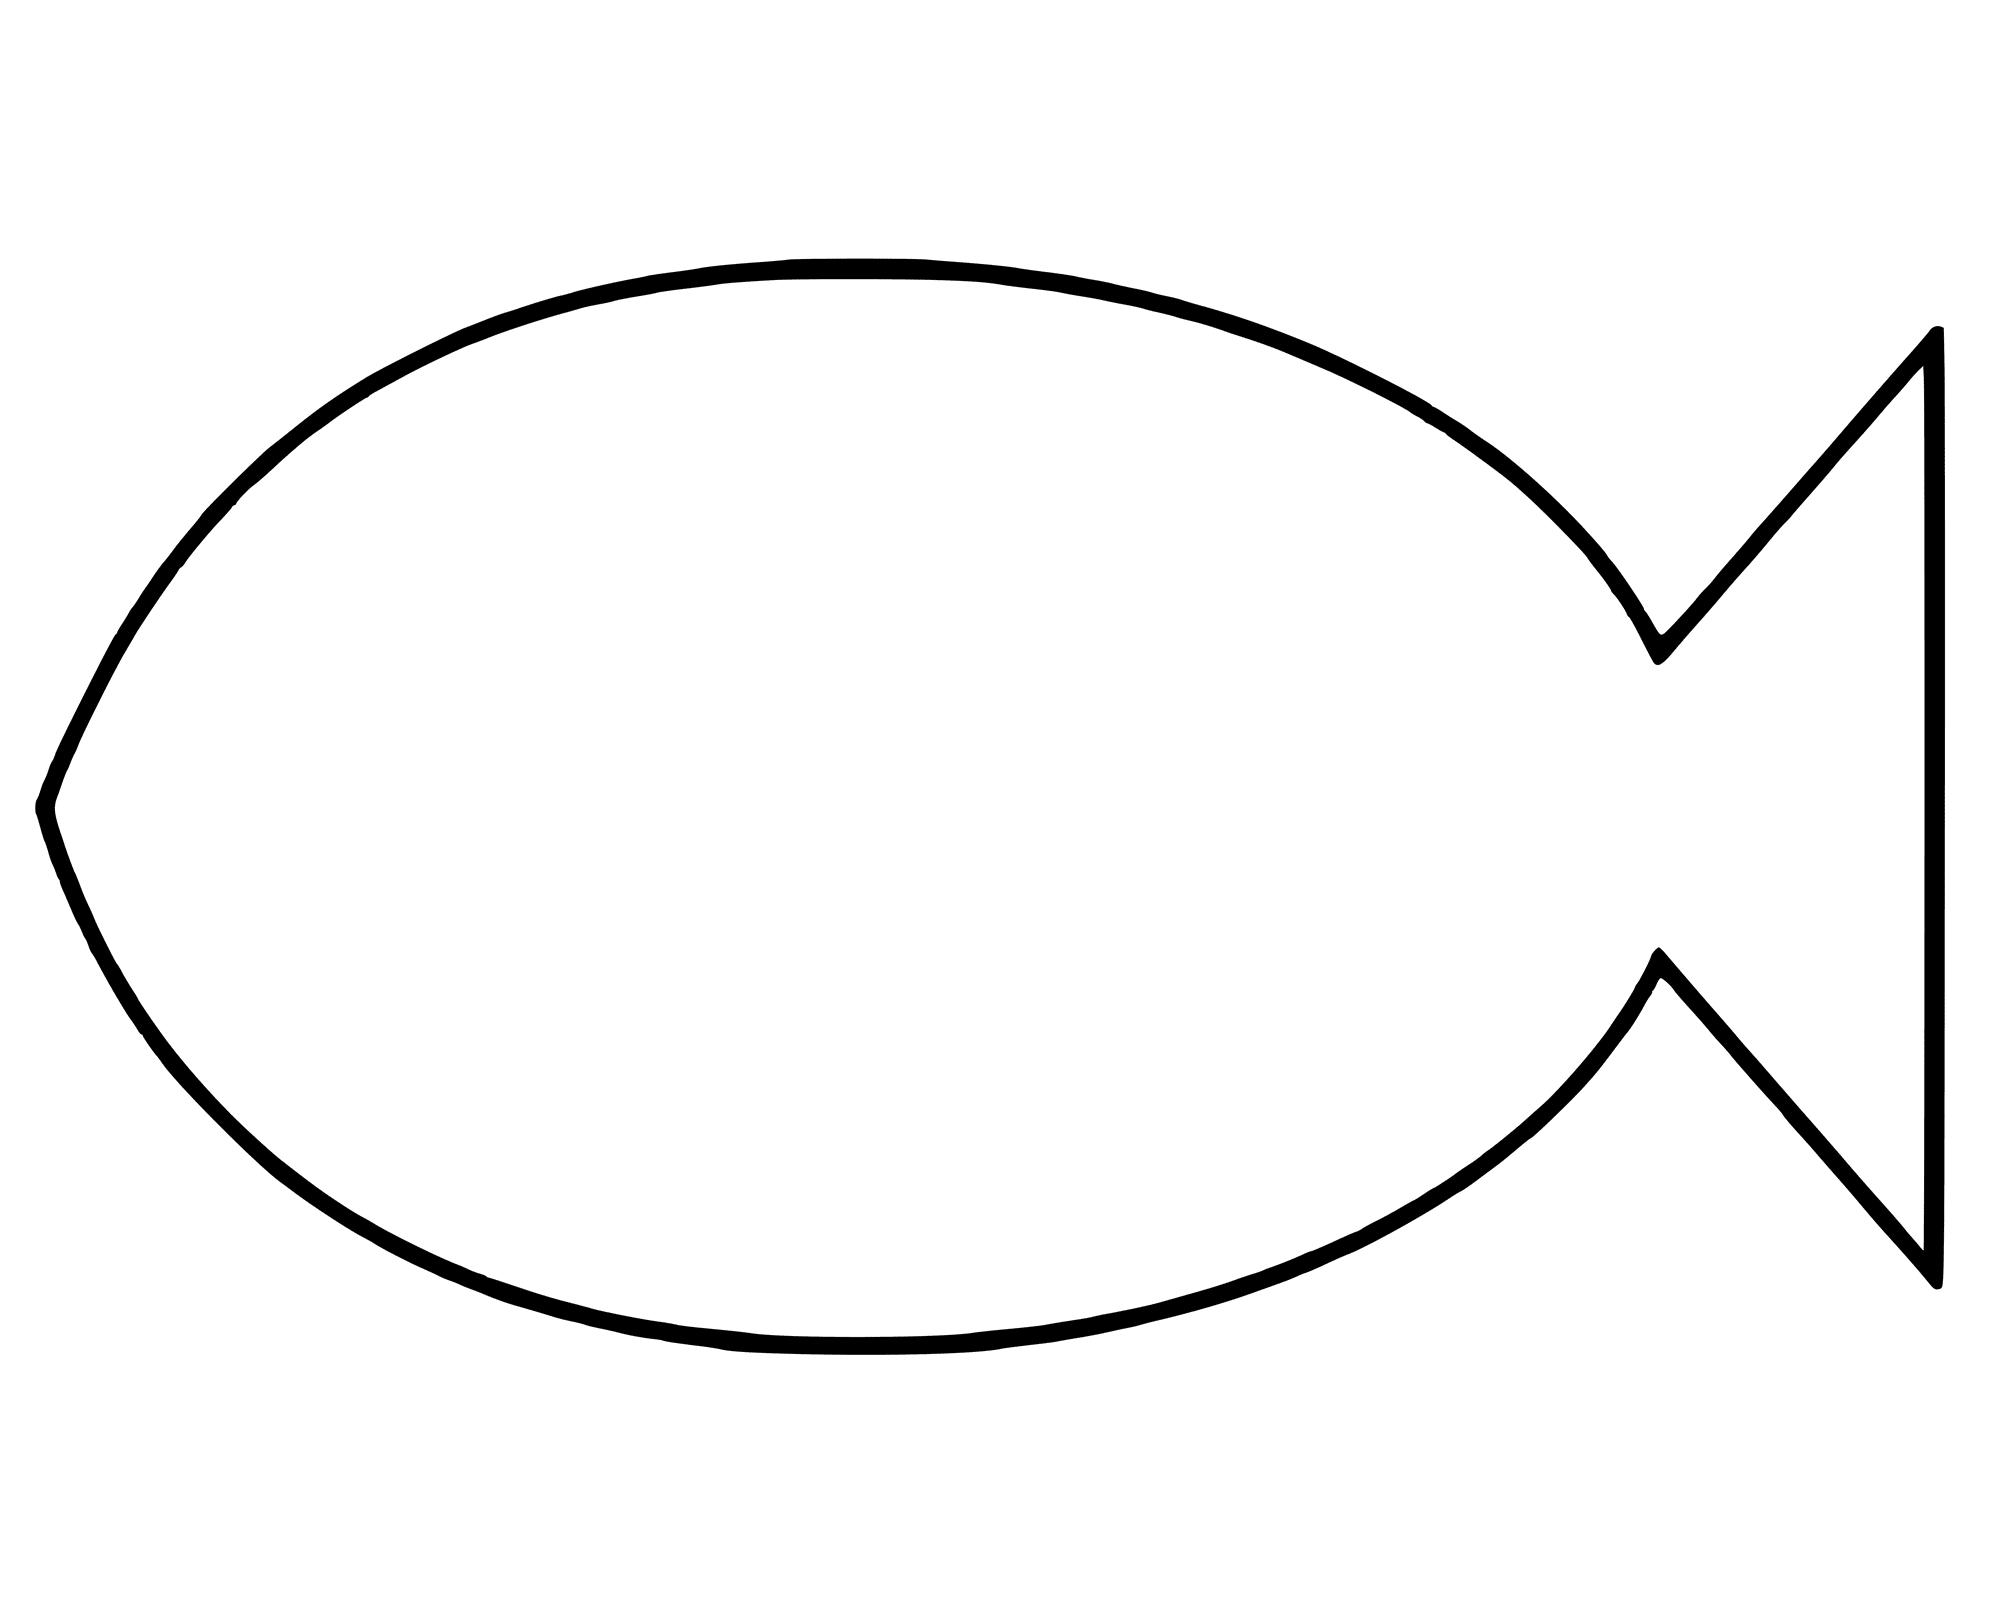 Fish Outline | Free download best Fish Outline on ClipArtMag.com